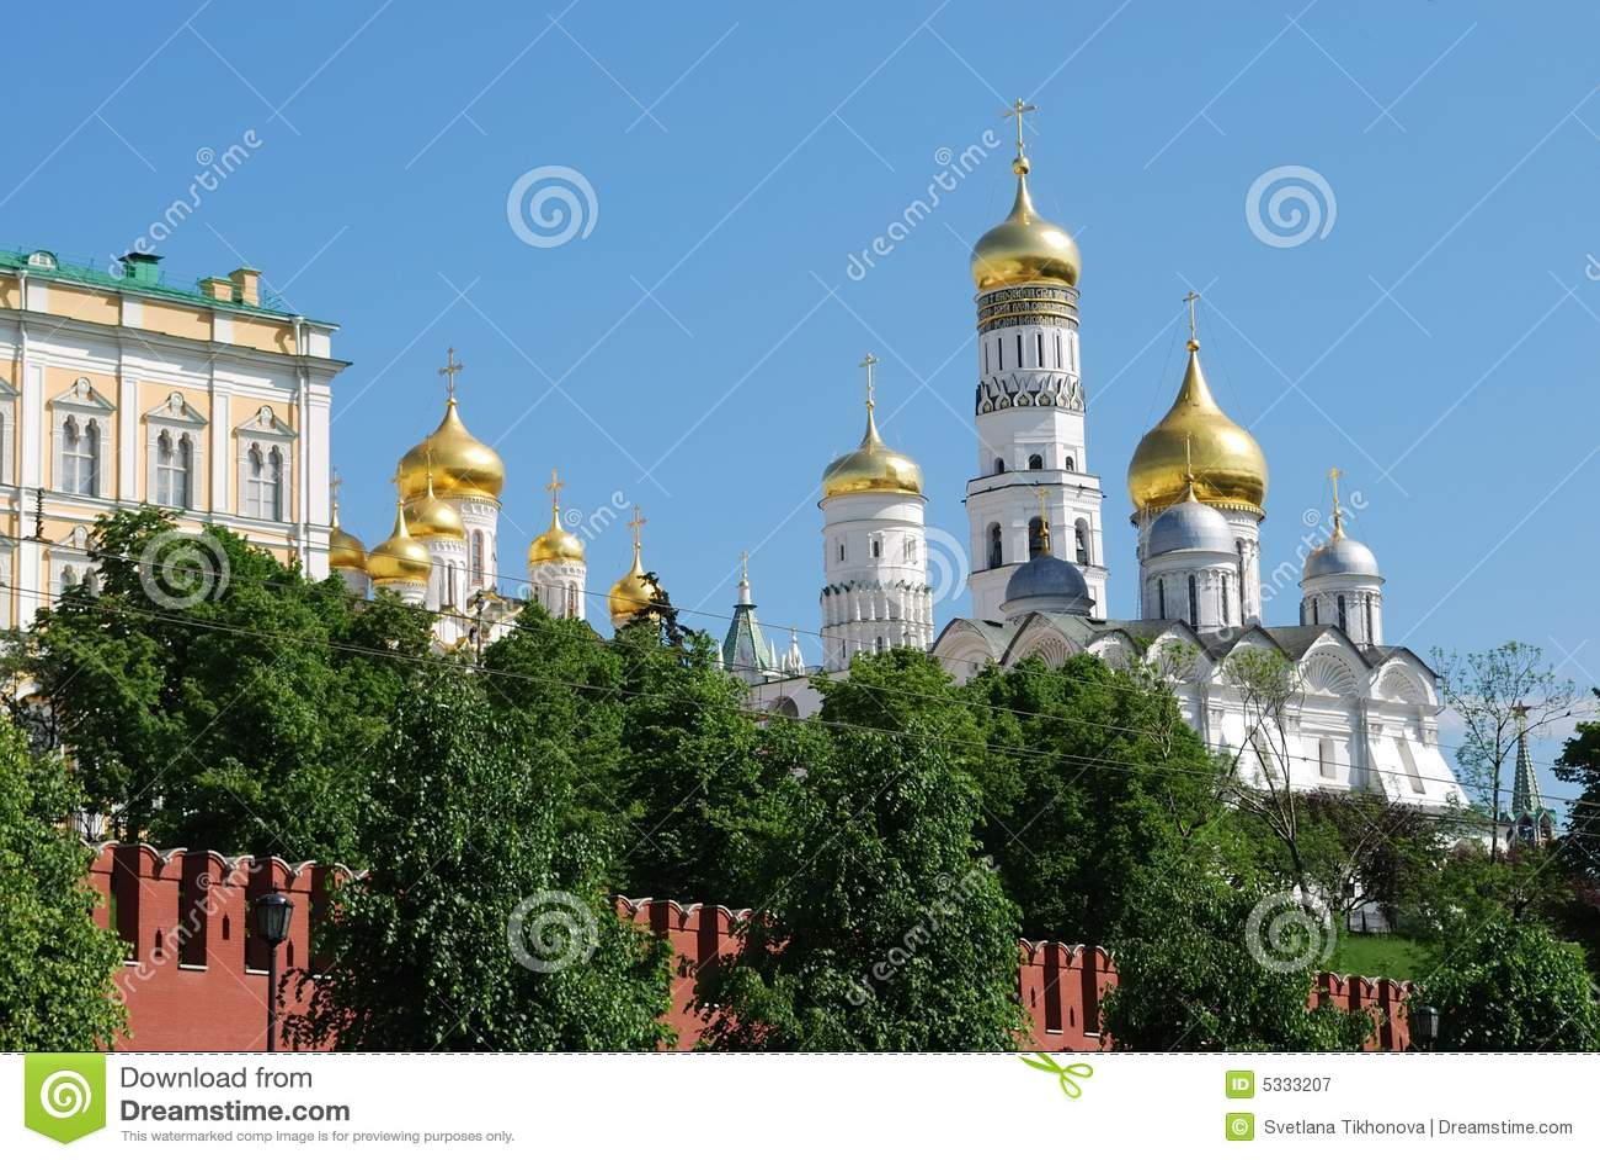 Kreml Moscow katedry